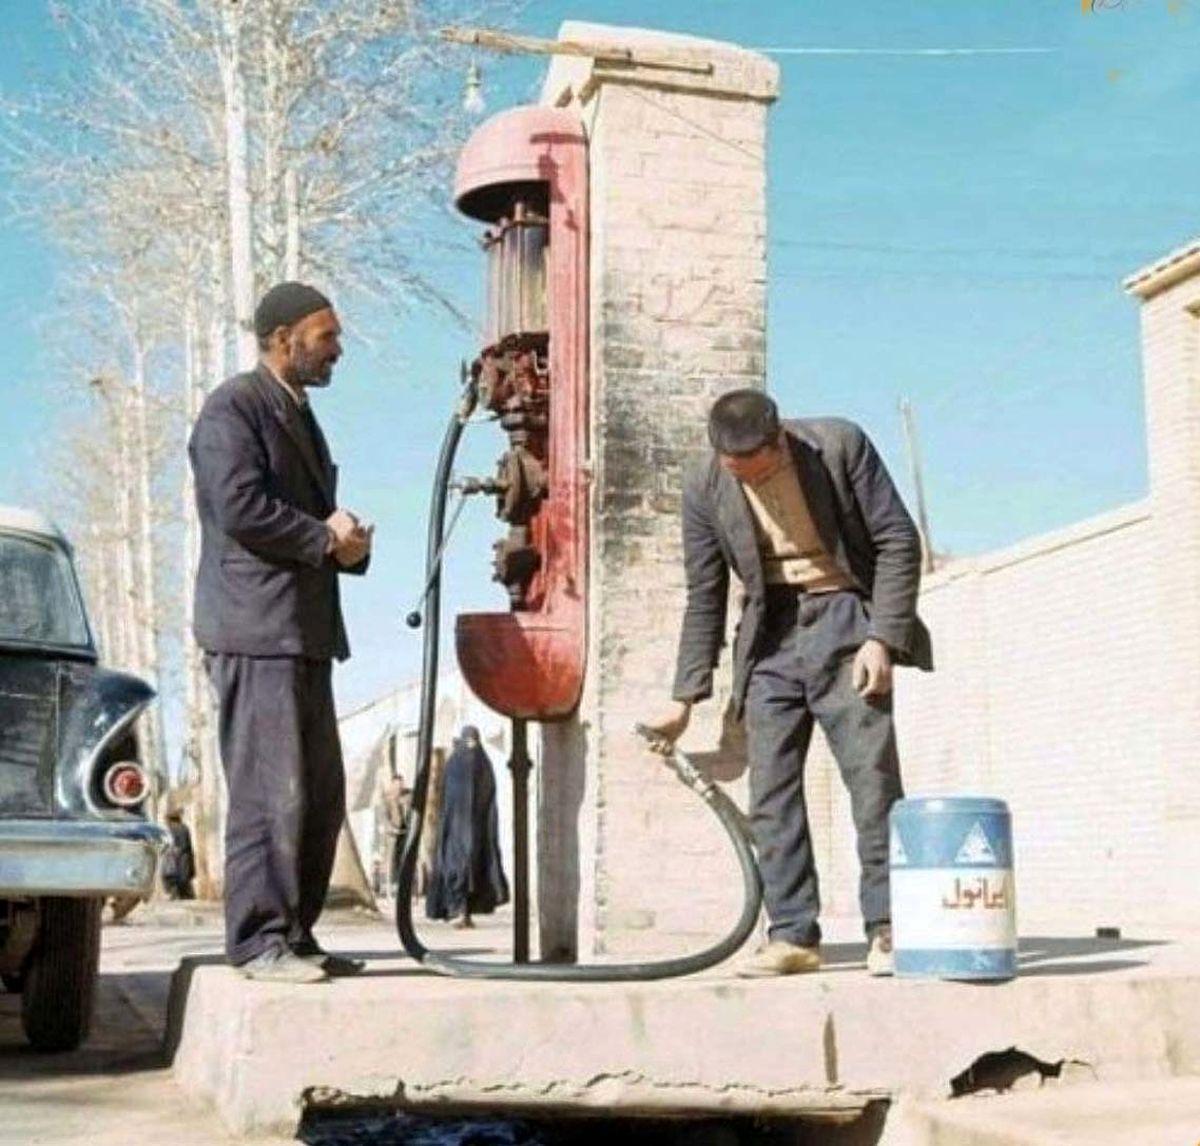 سکوهای پمپ بنزین تکی کنار خیابان دهه ۴۰